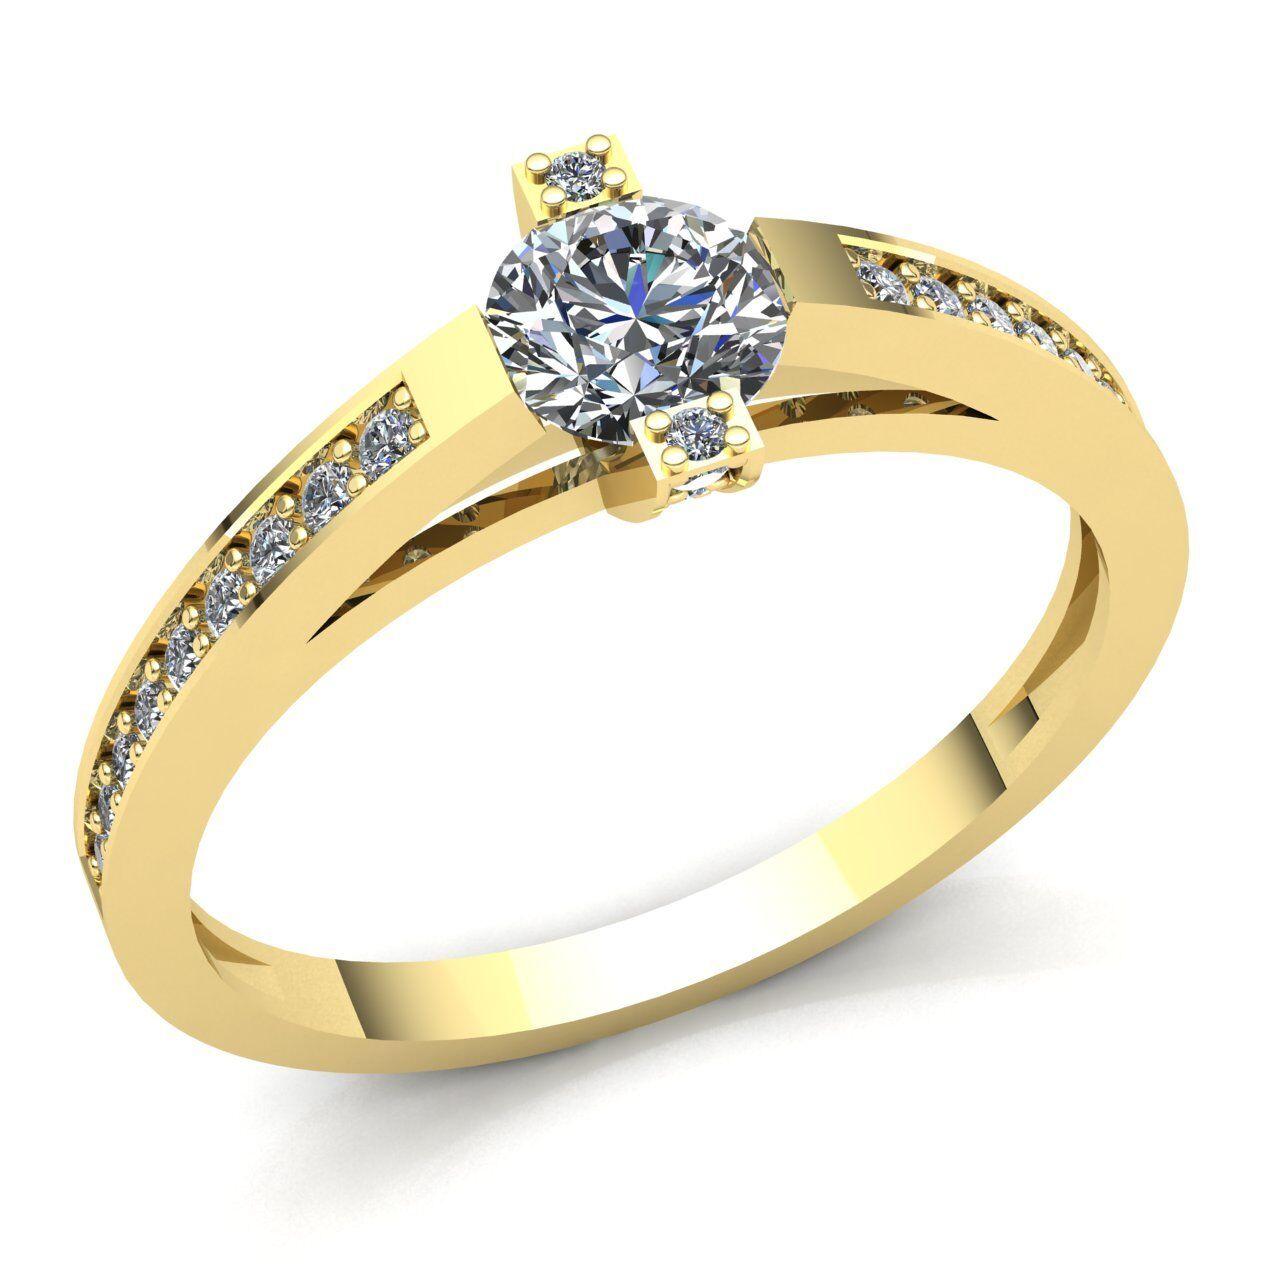 0.5carat Round Cut Diamond Ladies Accent Solitaire Engagement Ring 10K gold